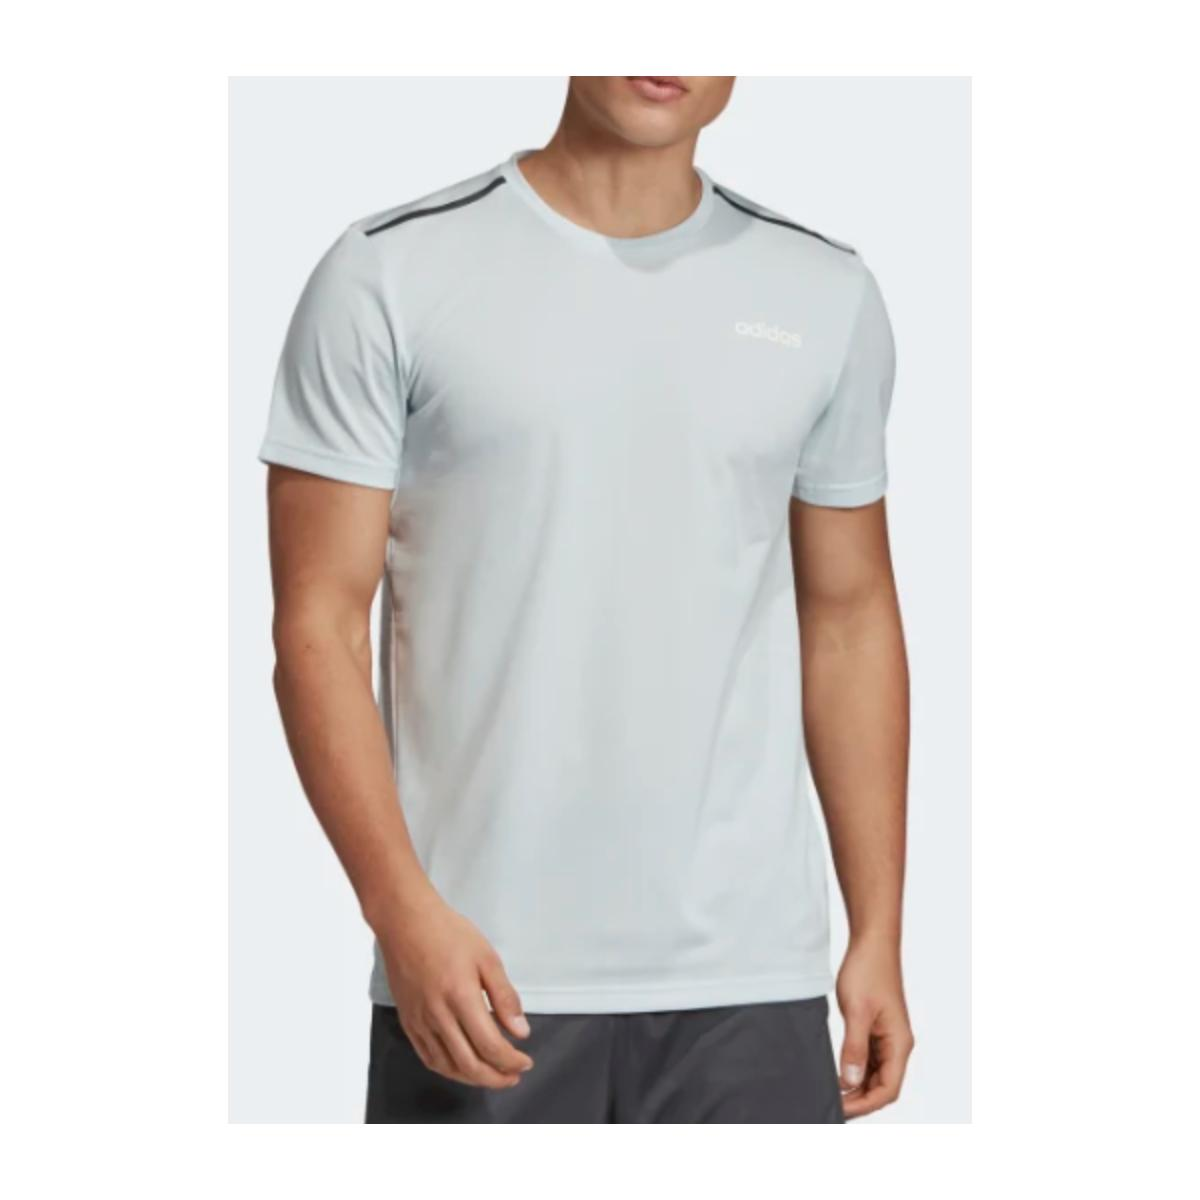 Camiseta Masculina Adidas Ei9763 m em Tee Azul Claro